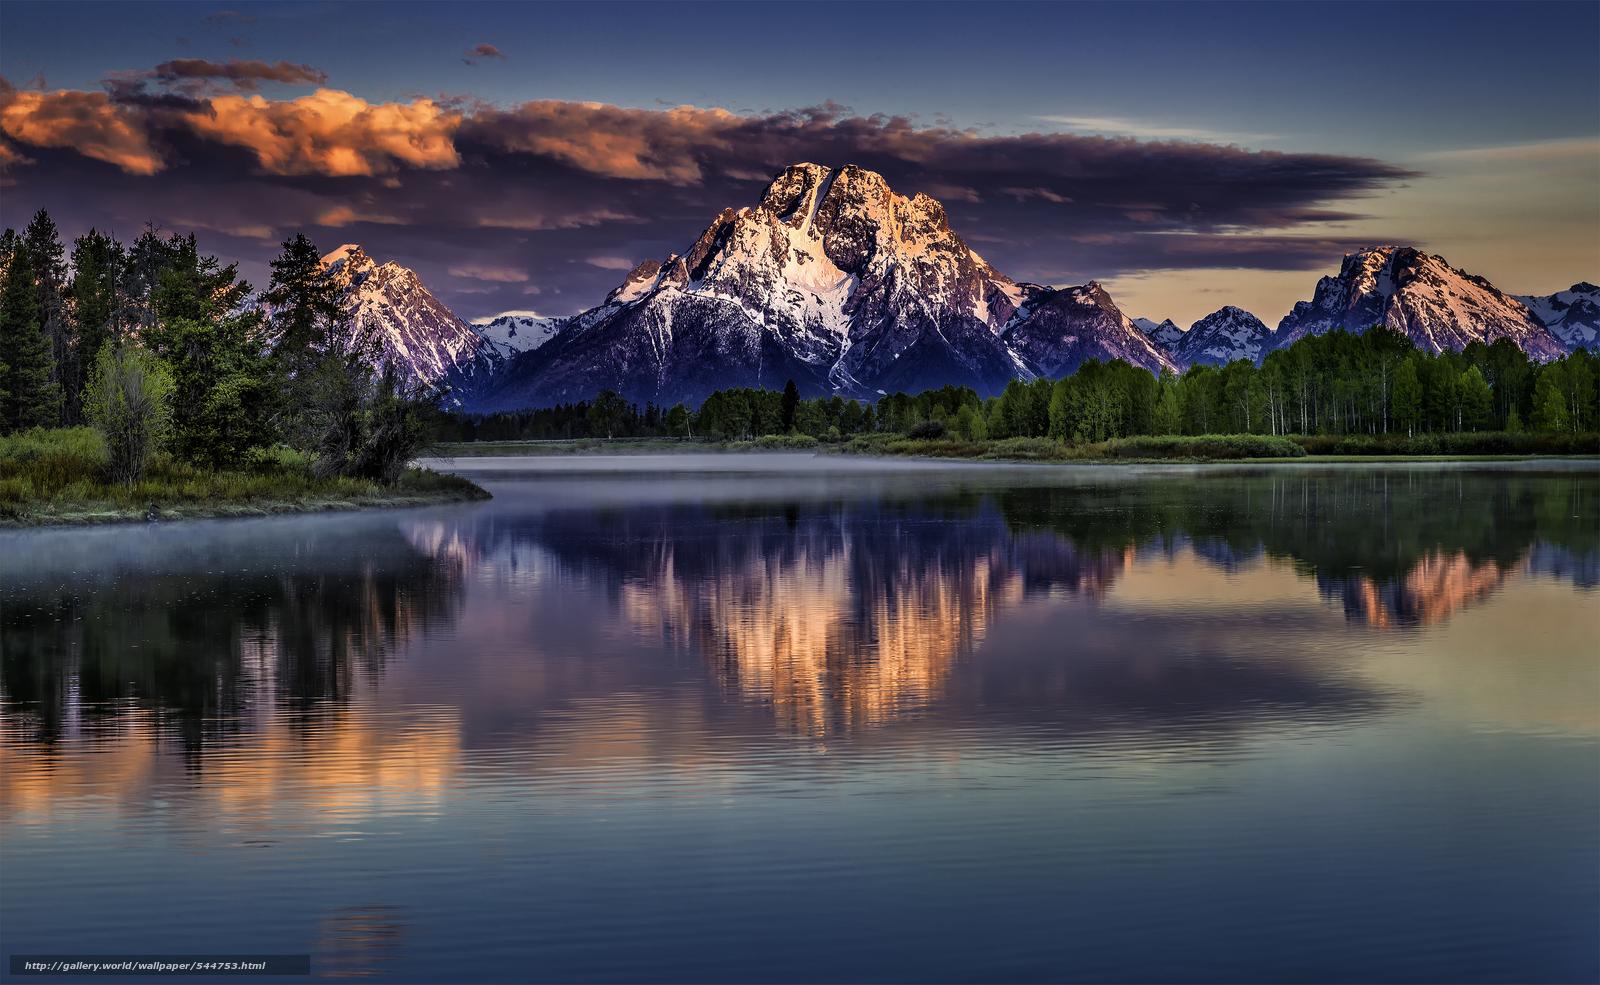 Fondos de montanas y valles | Montana, Posts and Wallpapers